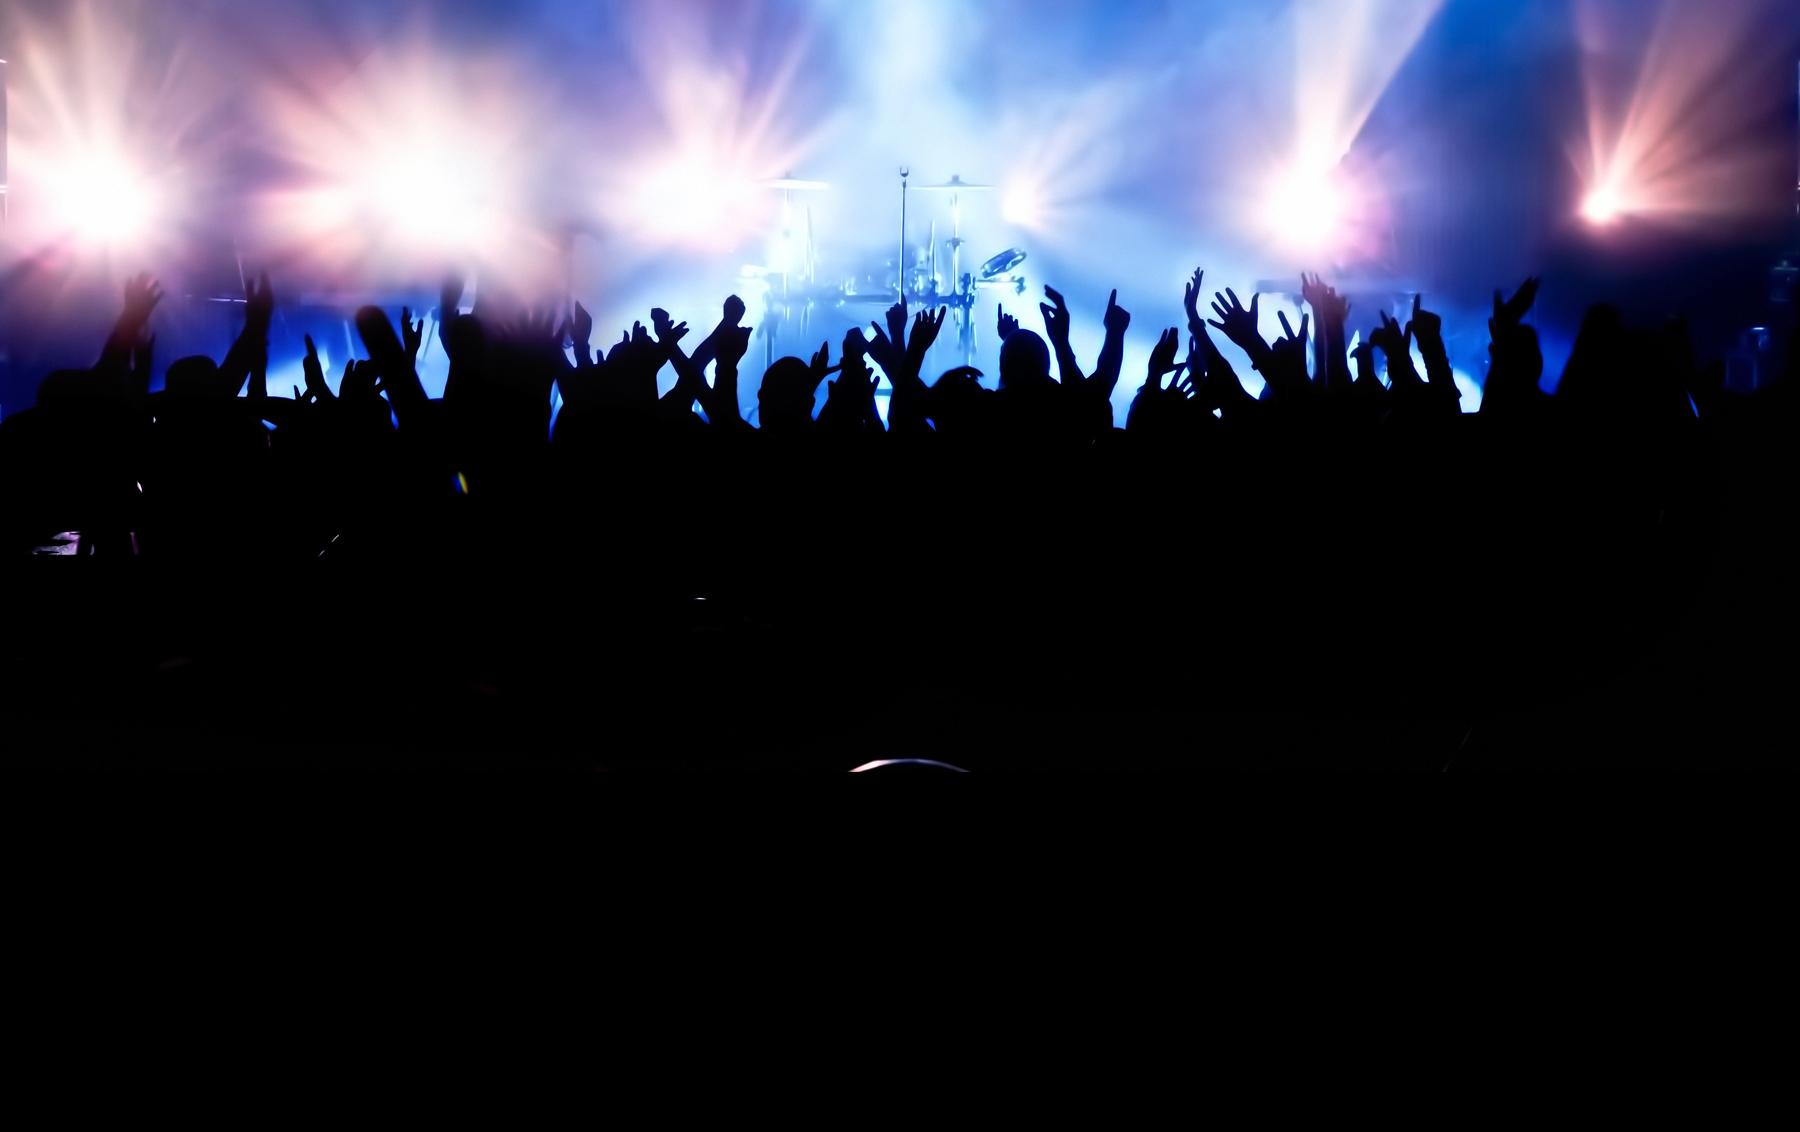 concert crowd free best hd wallpapers